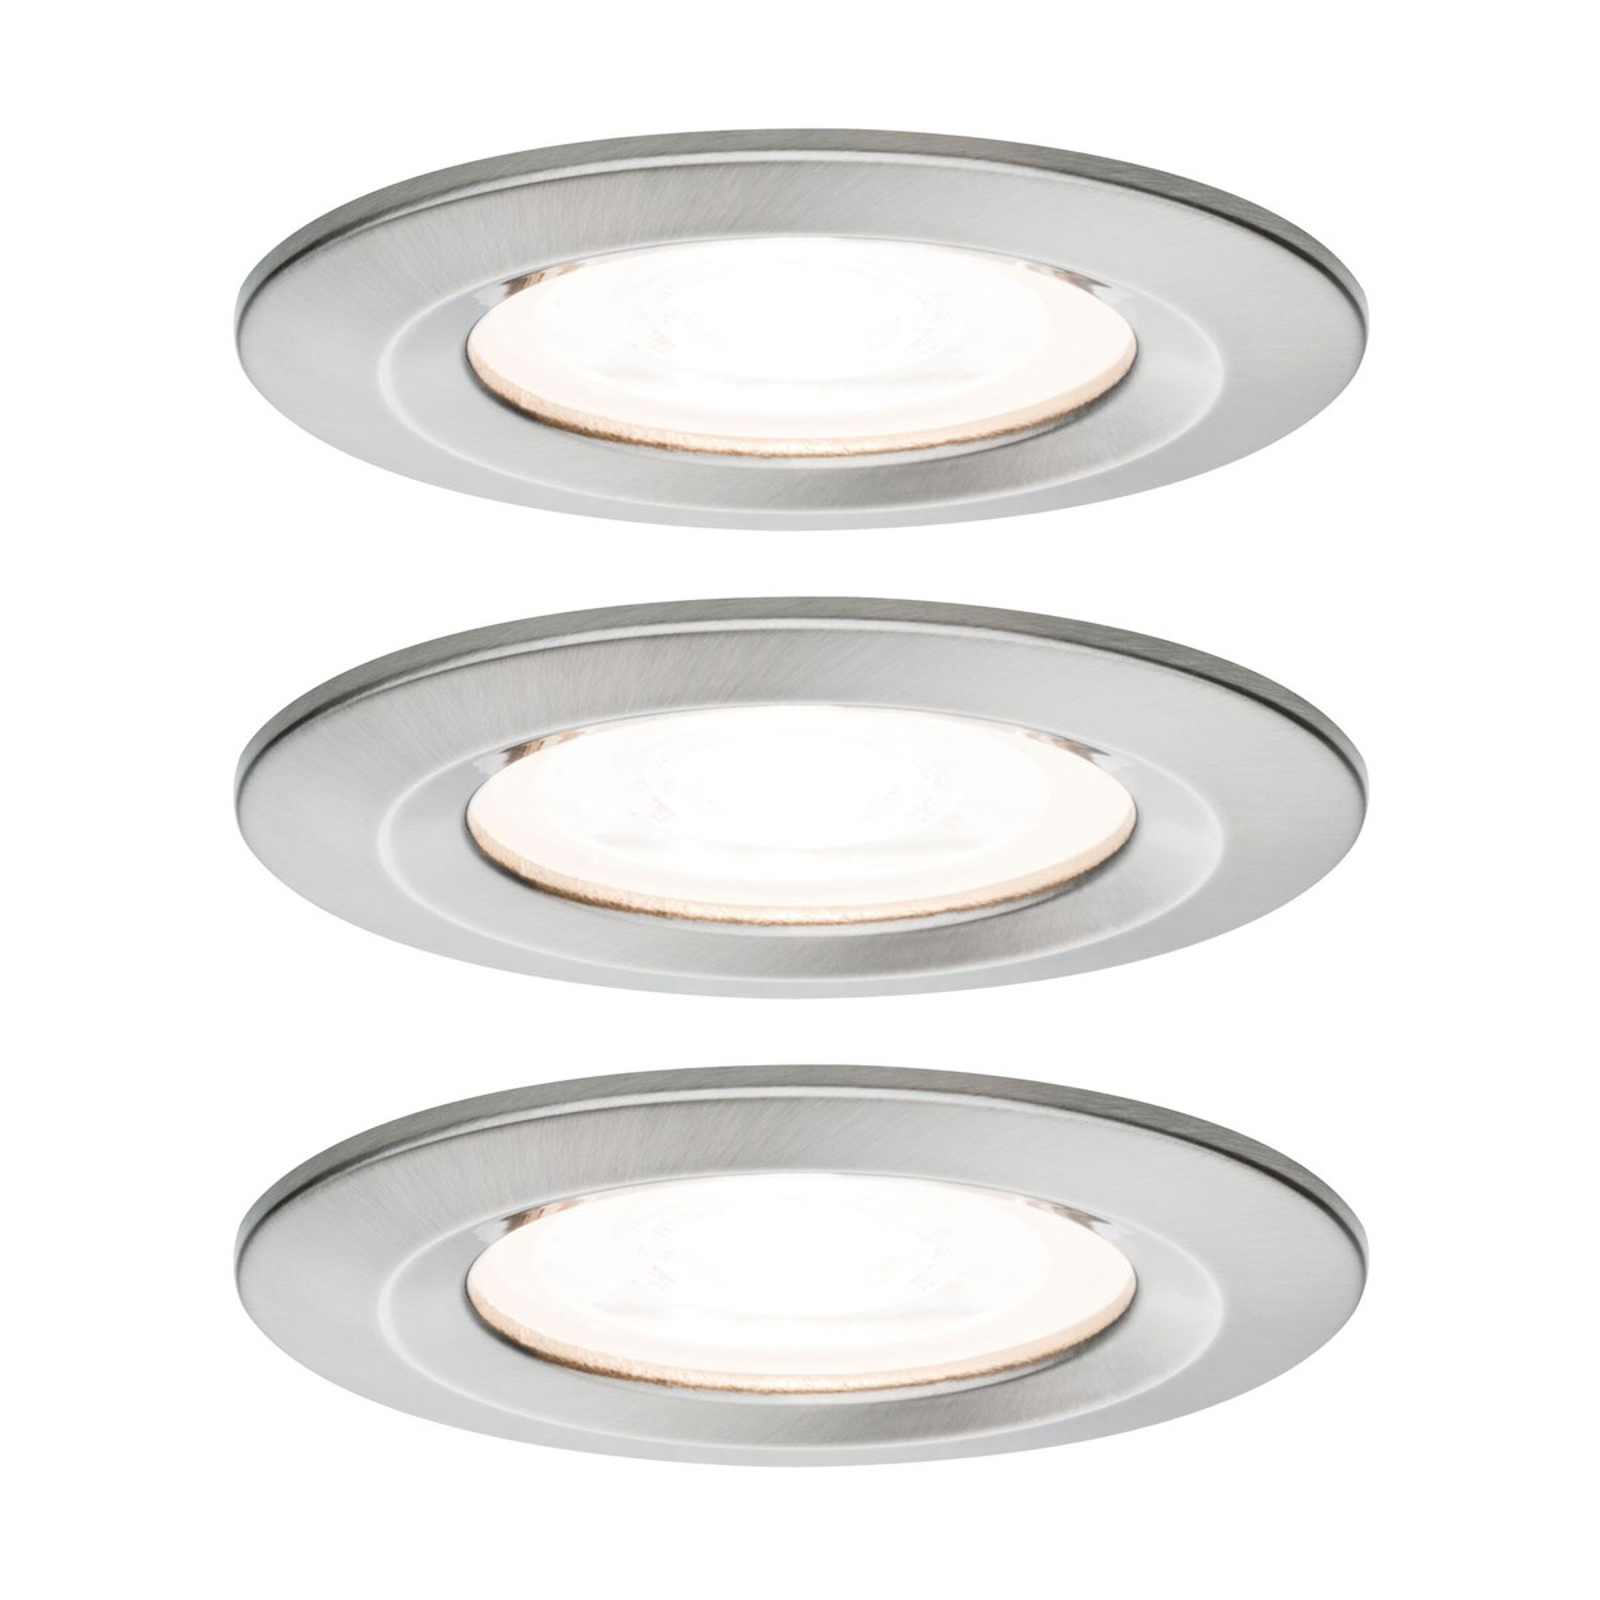 Paulmann 3p LED-spot Nova rund, IP44, dimbar, jern